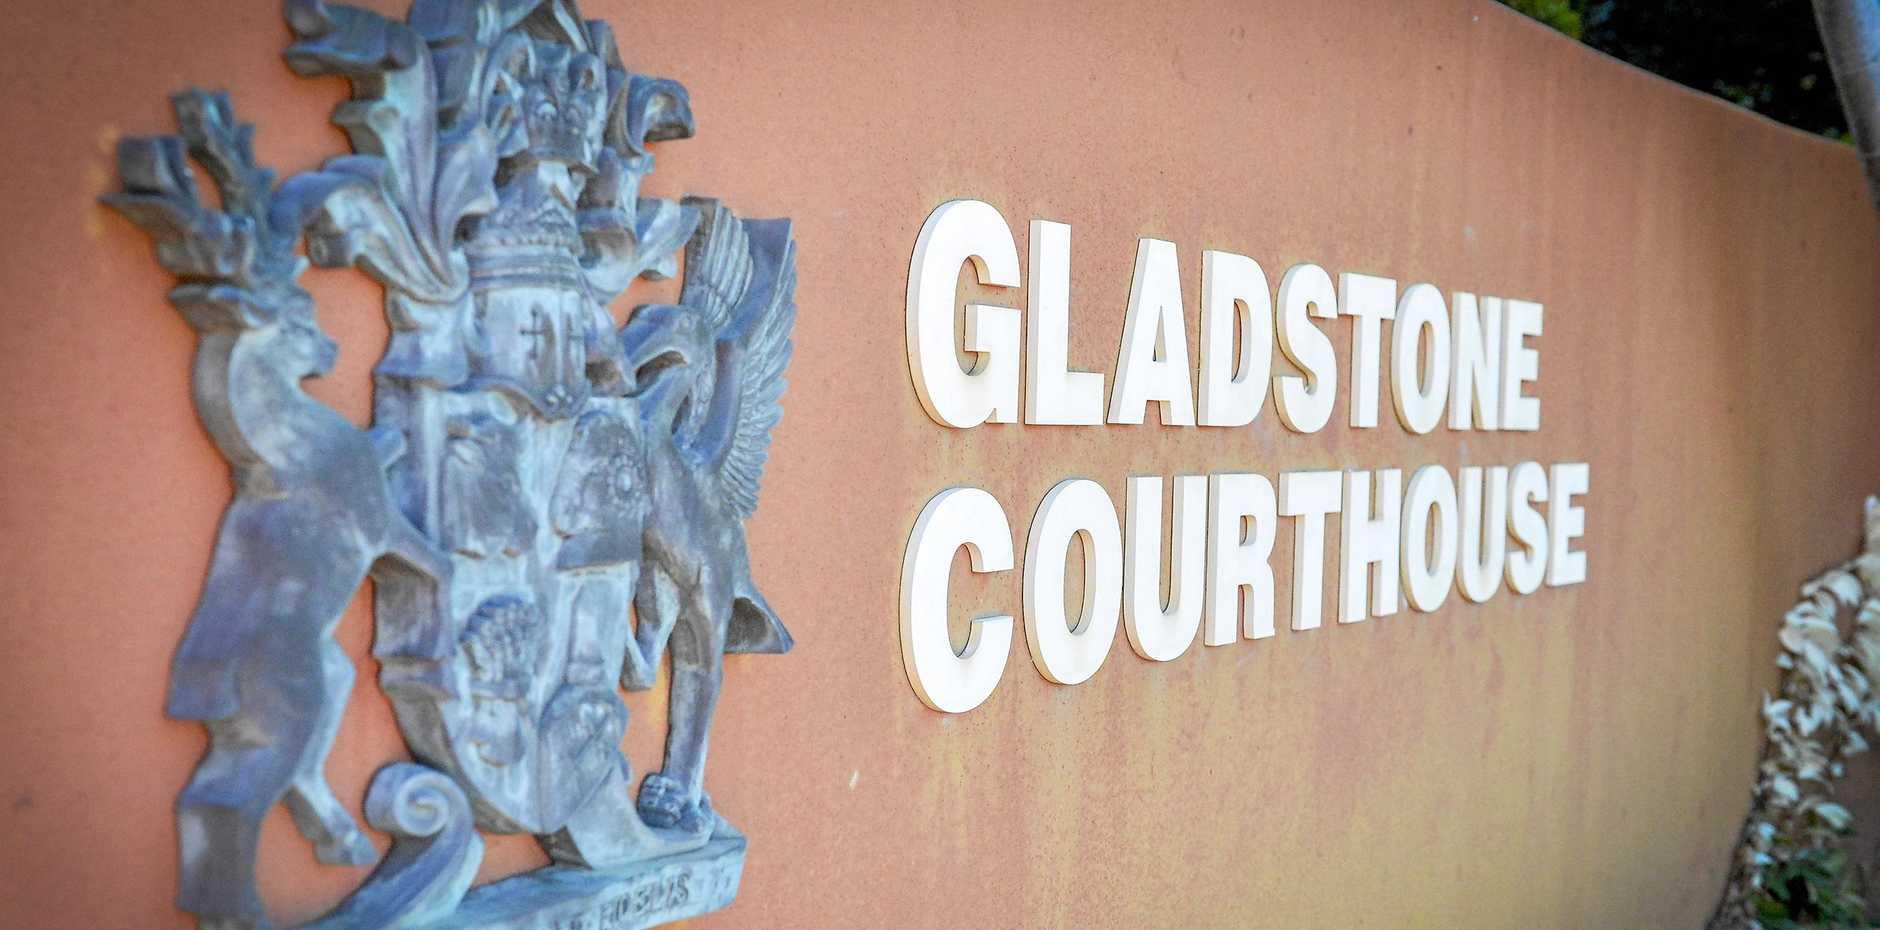 Gladstone Court House. Courthouse.